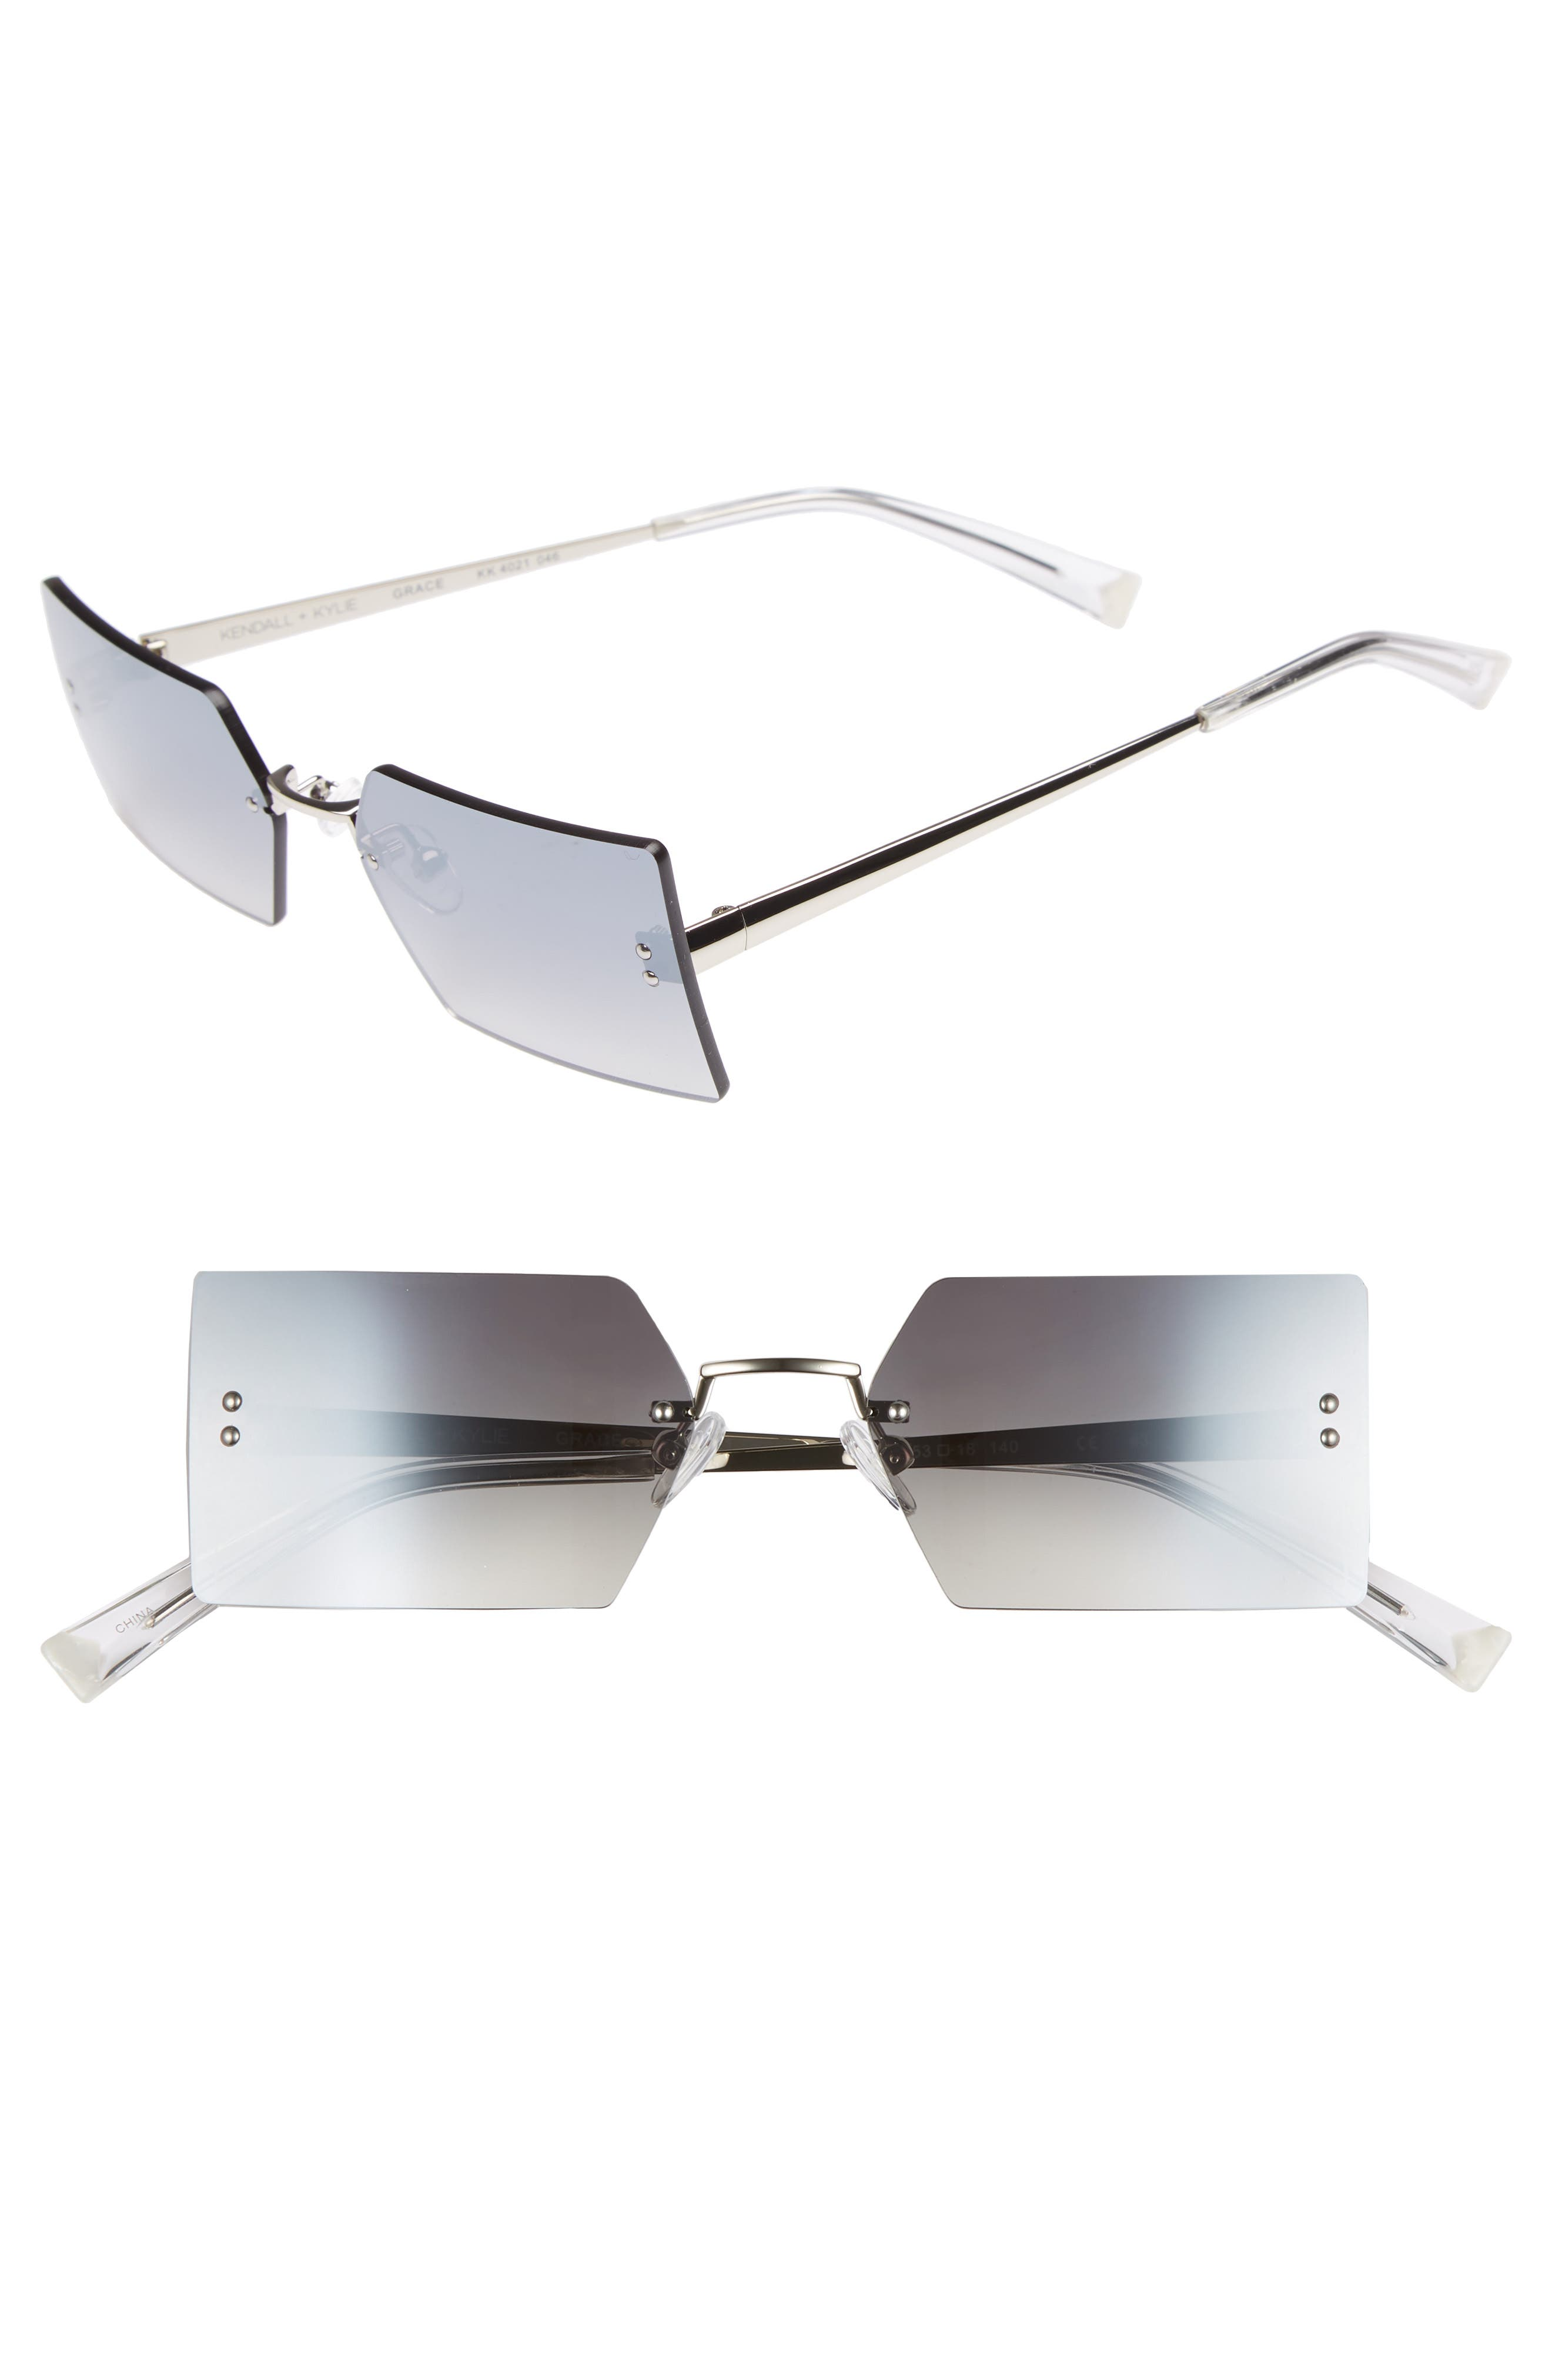 Grace 53mm Rimless Rectangular Sunglasses,                             Main thumbnail 1, color,                             Silver/ Smoke Gradient Flash